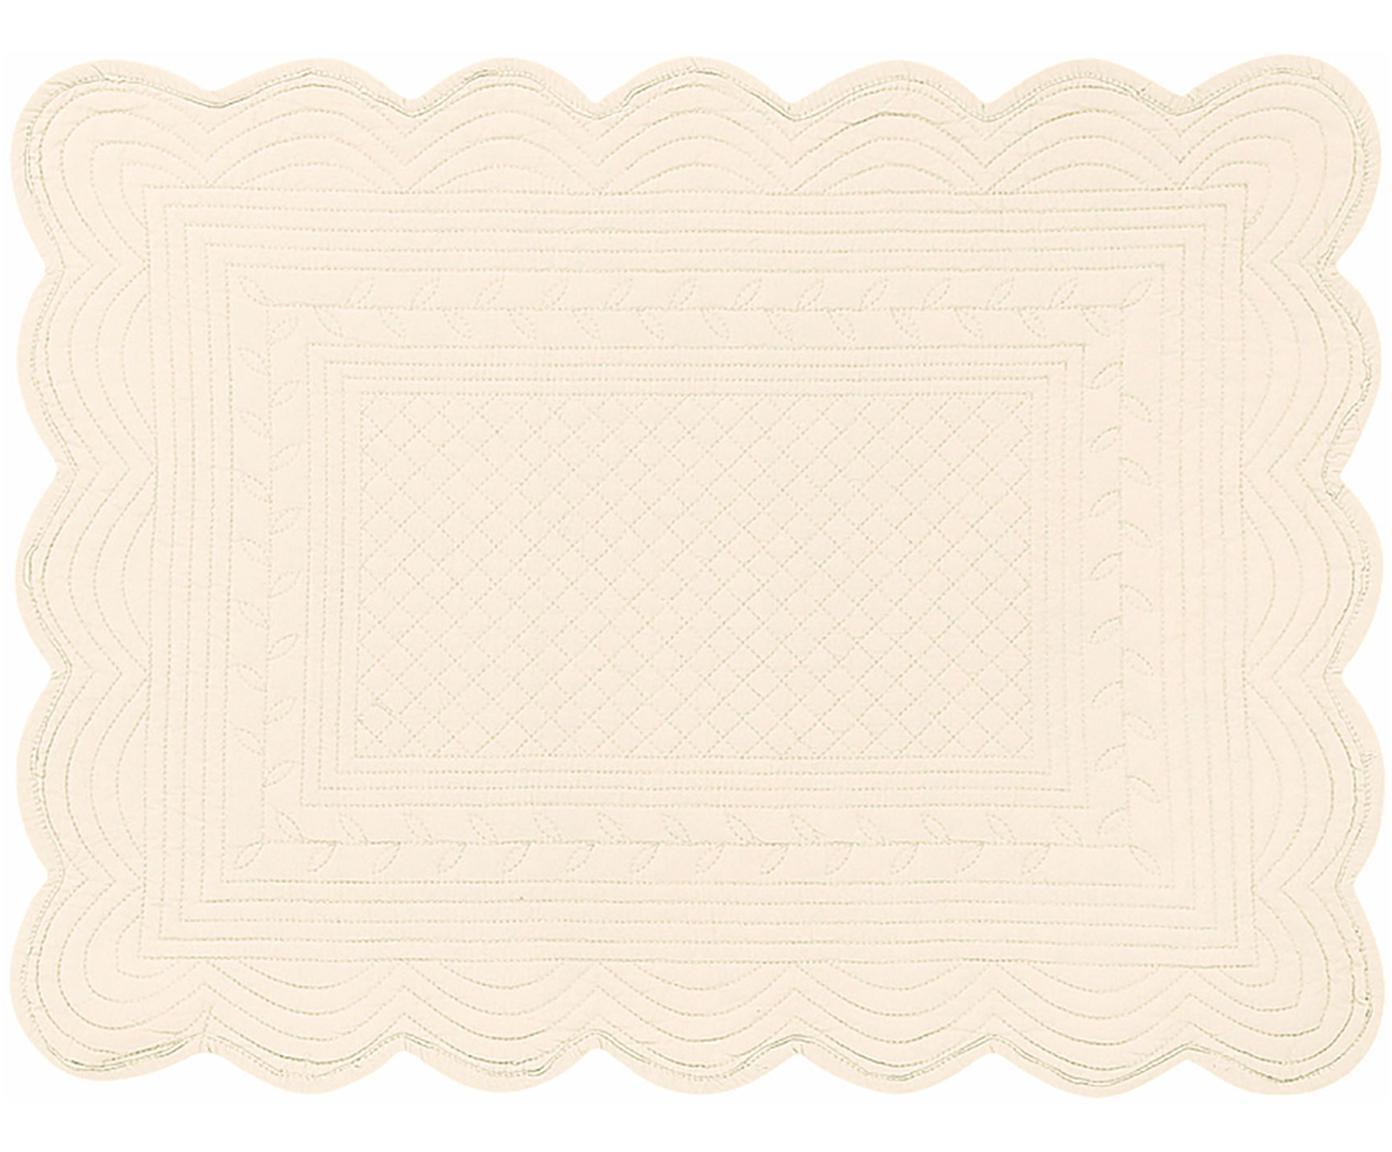 Podkładka Boutis, 6 szt., Bawełna, Kość słoniowa, S 34 x D 48 cm